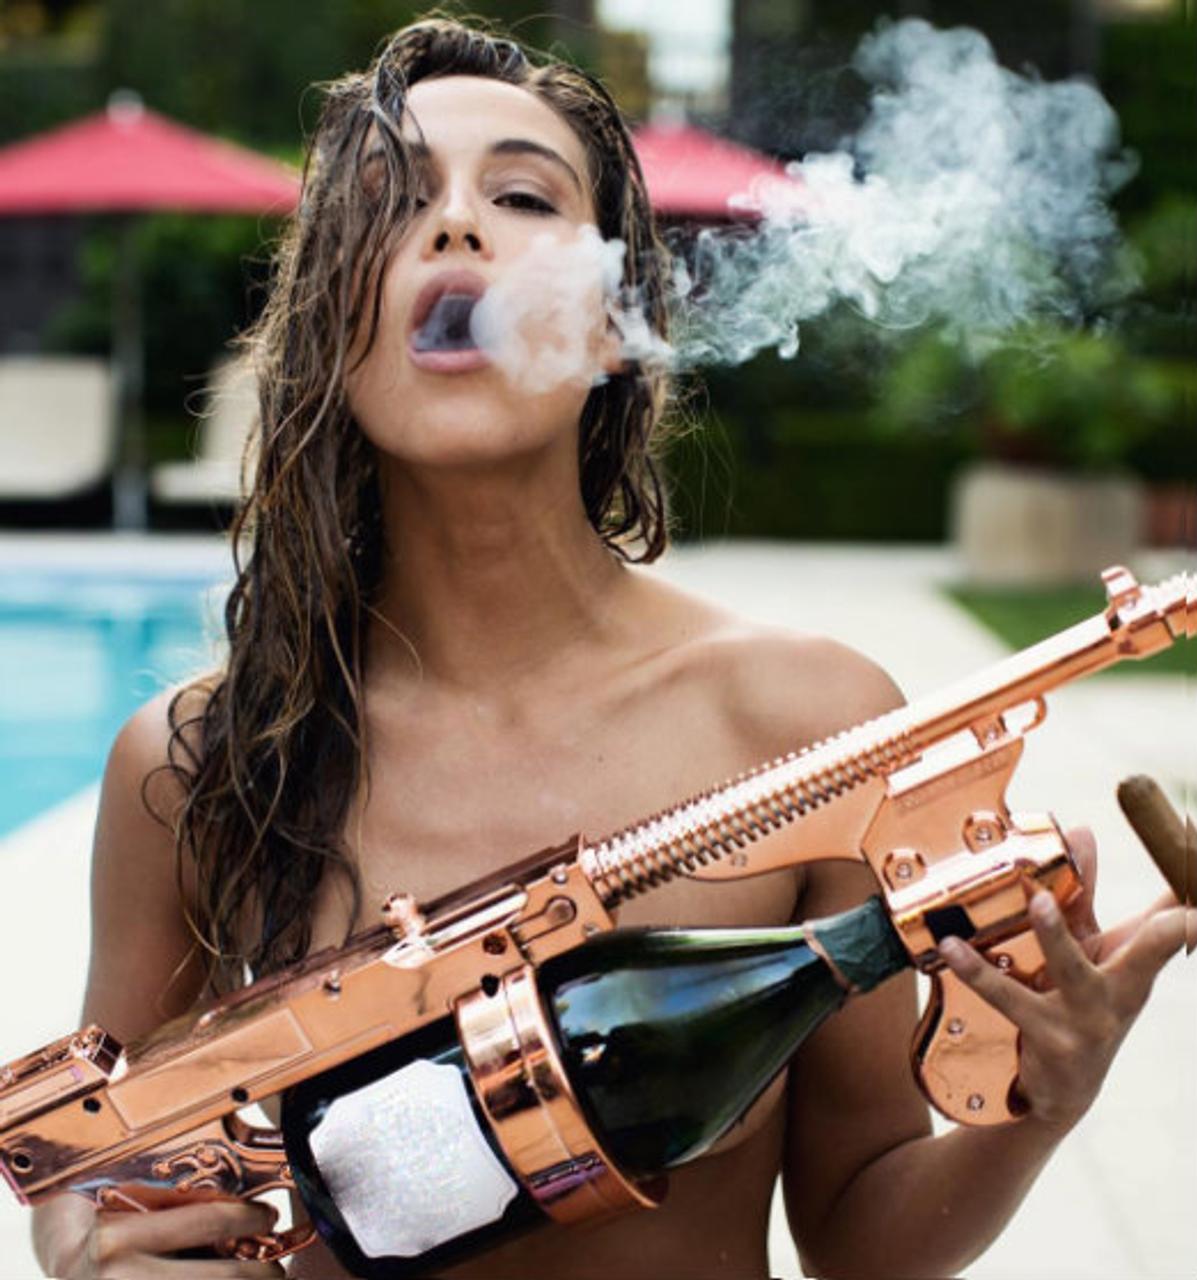 THE CHAMPAGNE SHOWERS CHAMPAGNE GUN - Make it Rain Champagne Machine Gun